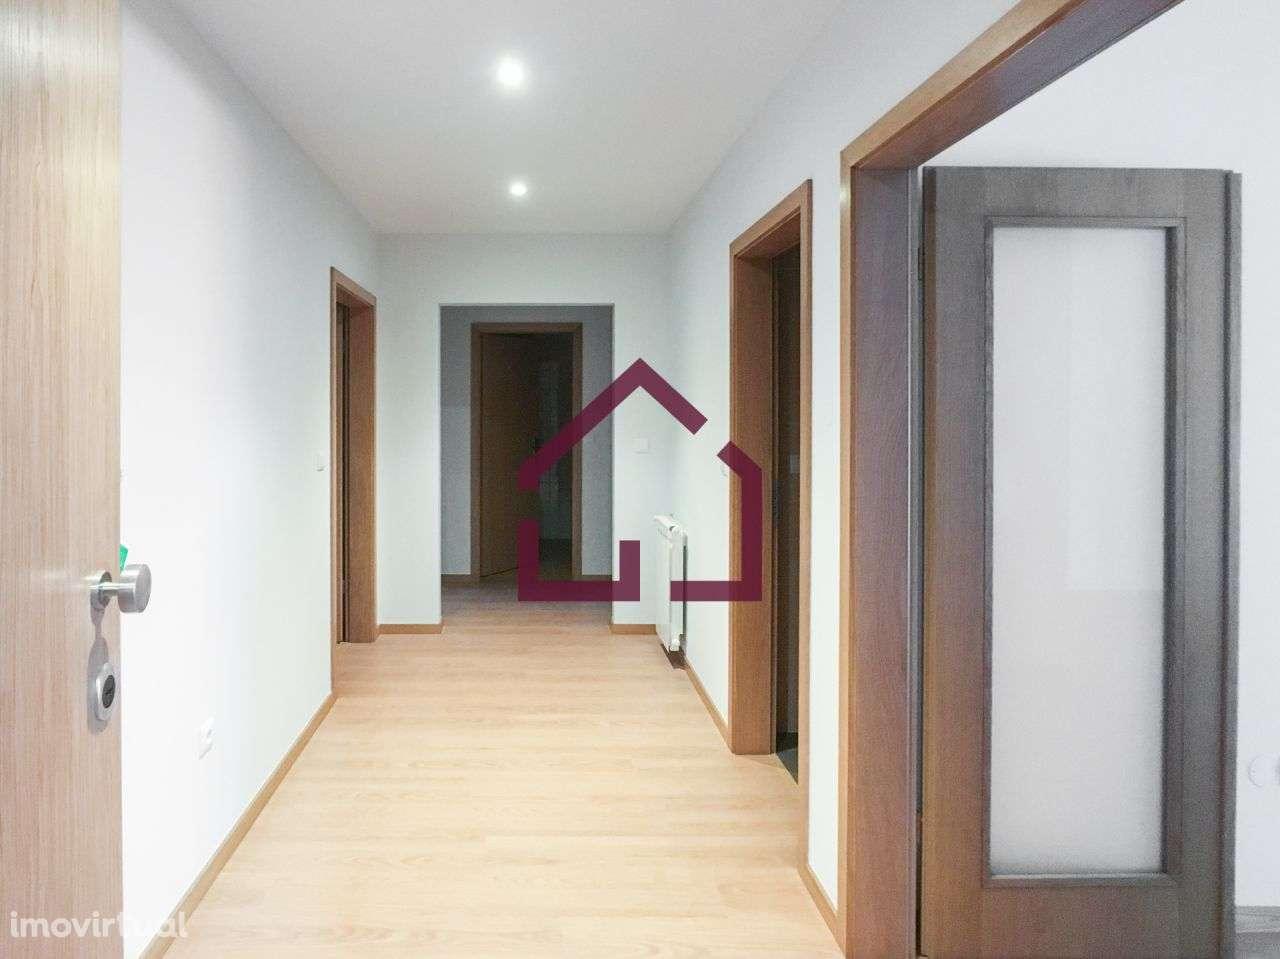 Apartamento para comprar, Oliveira de Azeméis, Santiago de Riba-Ul, Ul, Macinhata da Seixa e Madail, Aveiro - Foto 4